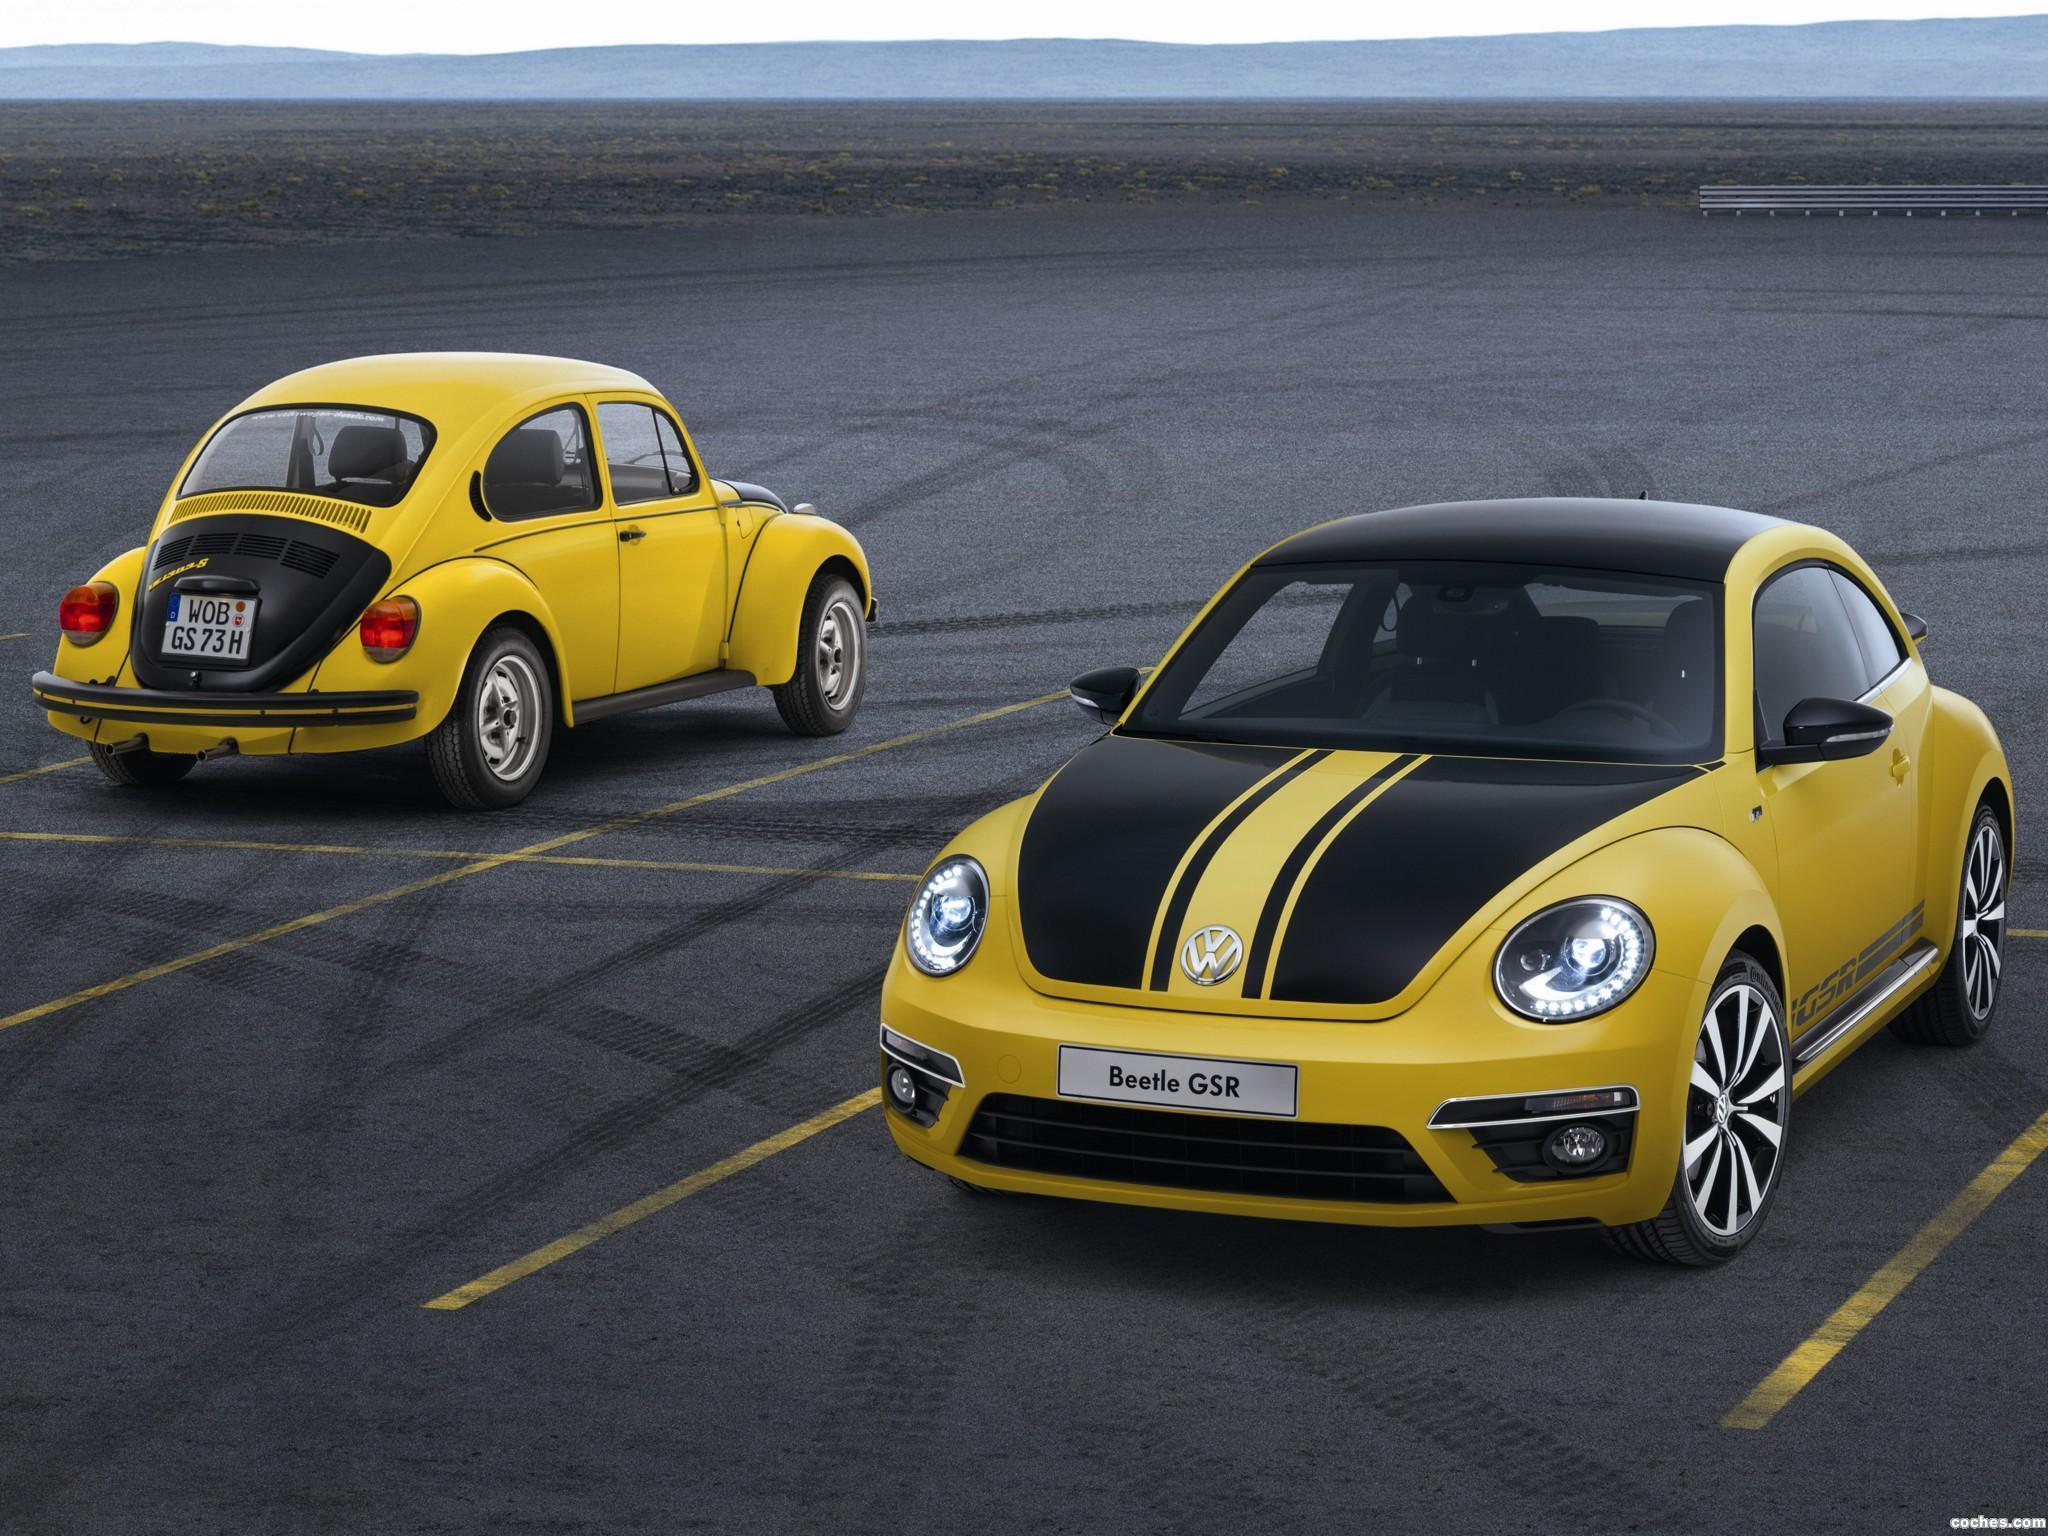 Foto 3 de Volkswagen Beetle GSR Limited Edition 2013